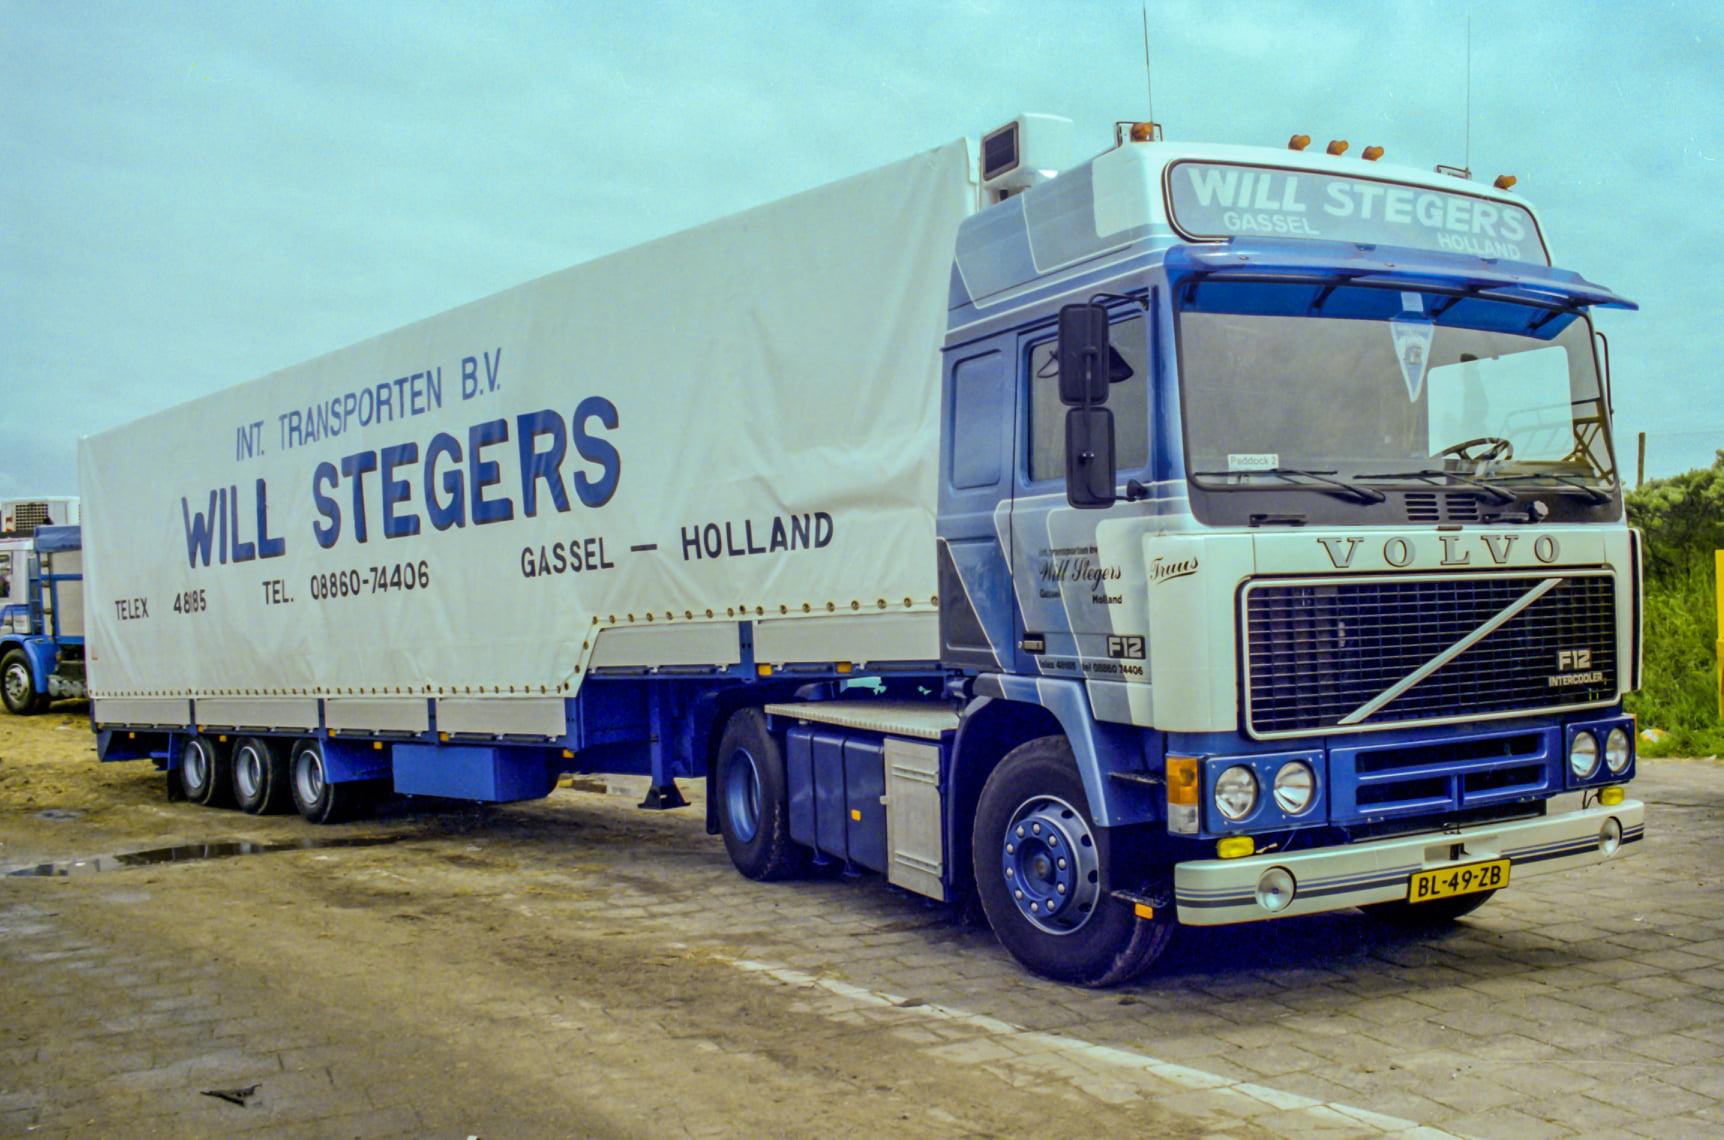 BL-49-ZB-Volvo-F12-Globetrotter